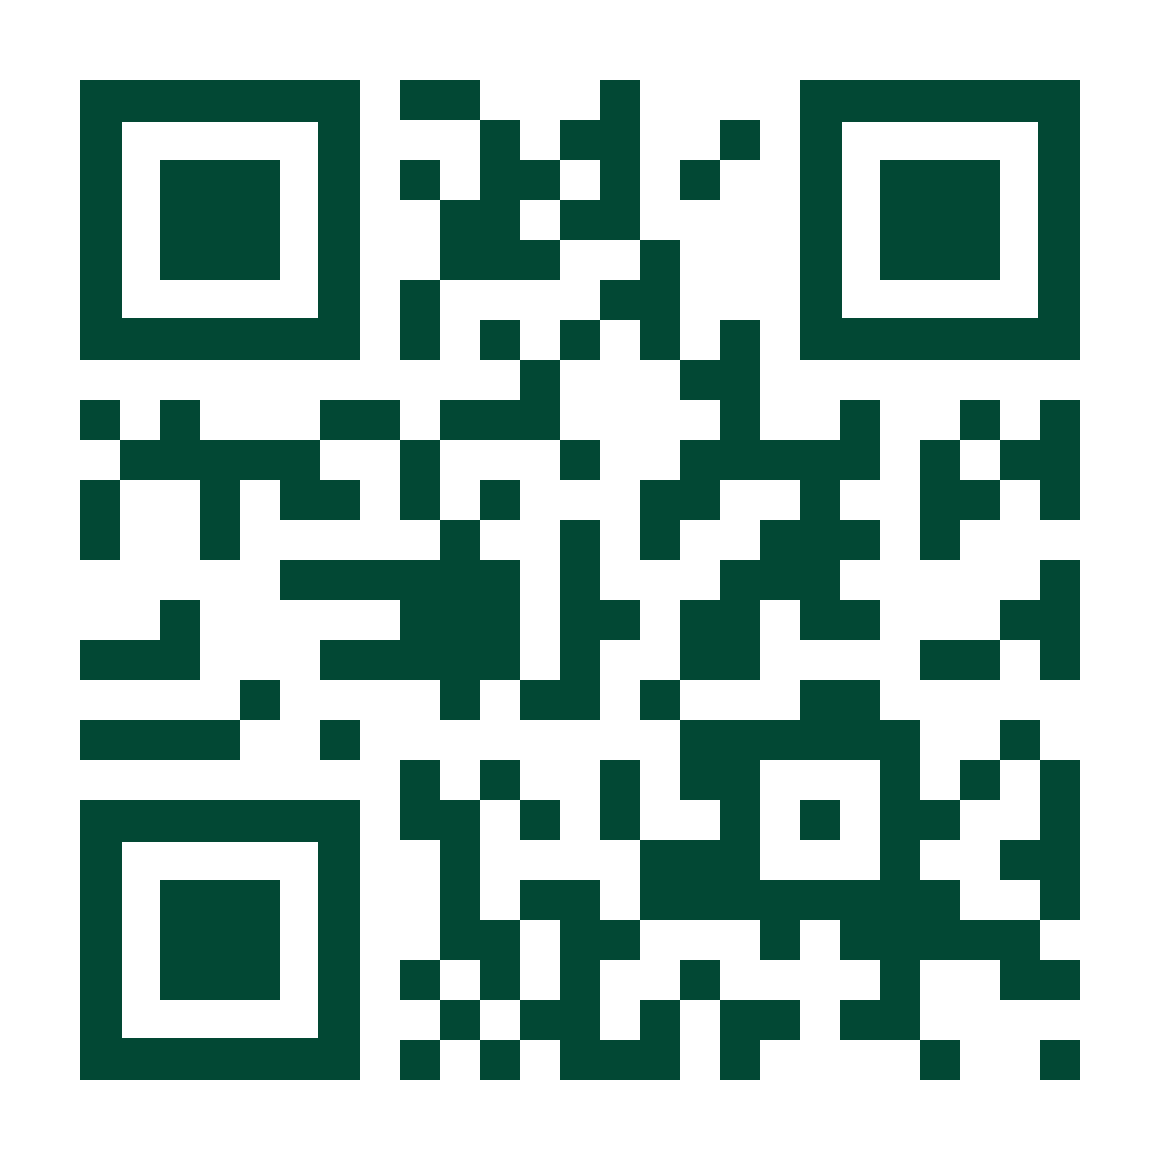 www.whpines.com qr code